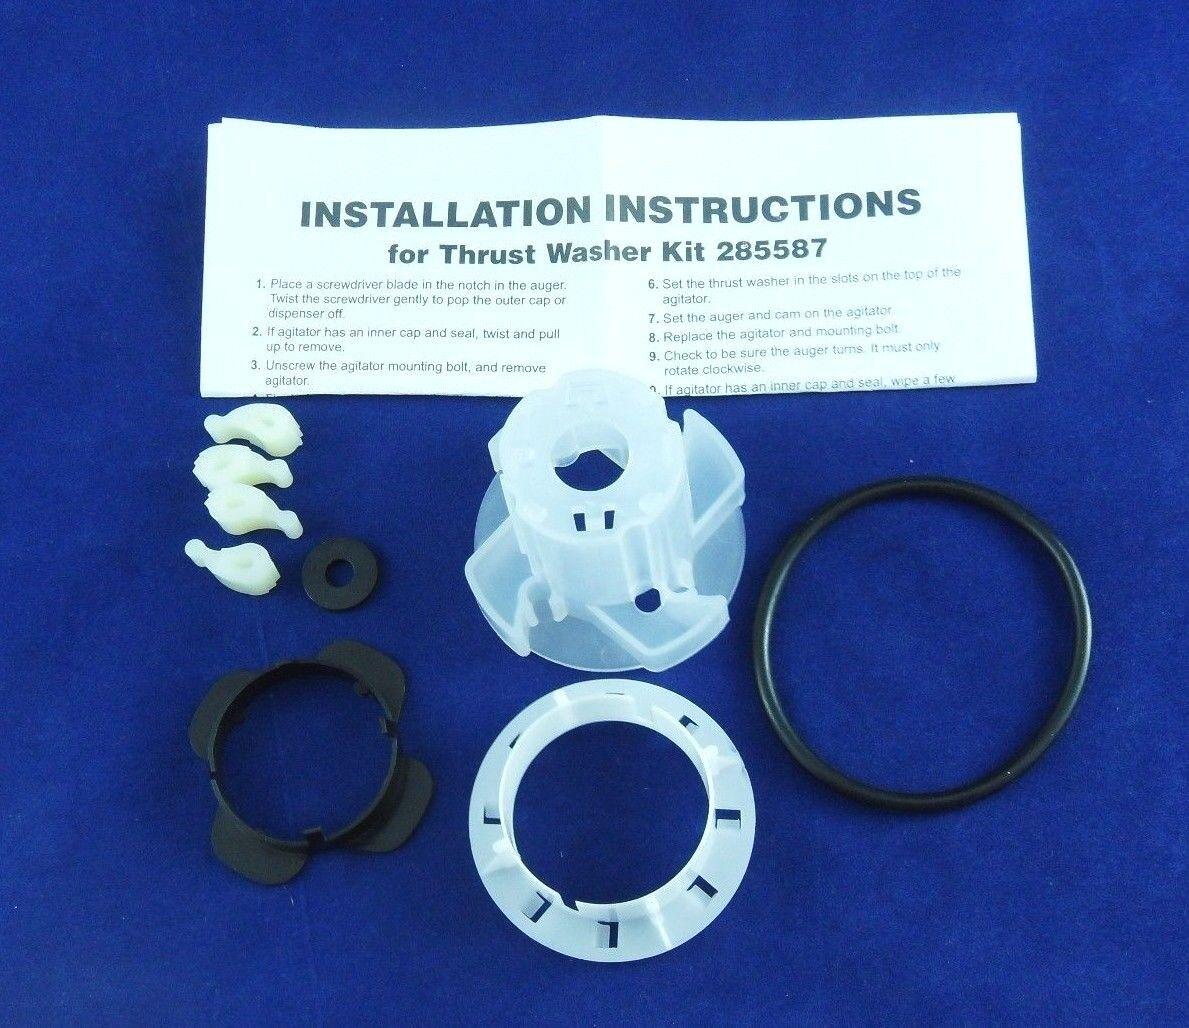 new washer agitator dogs cam kit 285811 for whirlpool kenmore ebay. Black Bedroom Furniture Sets. Home Design Ideas